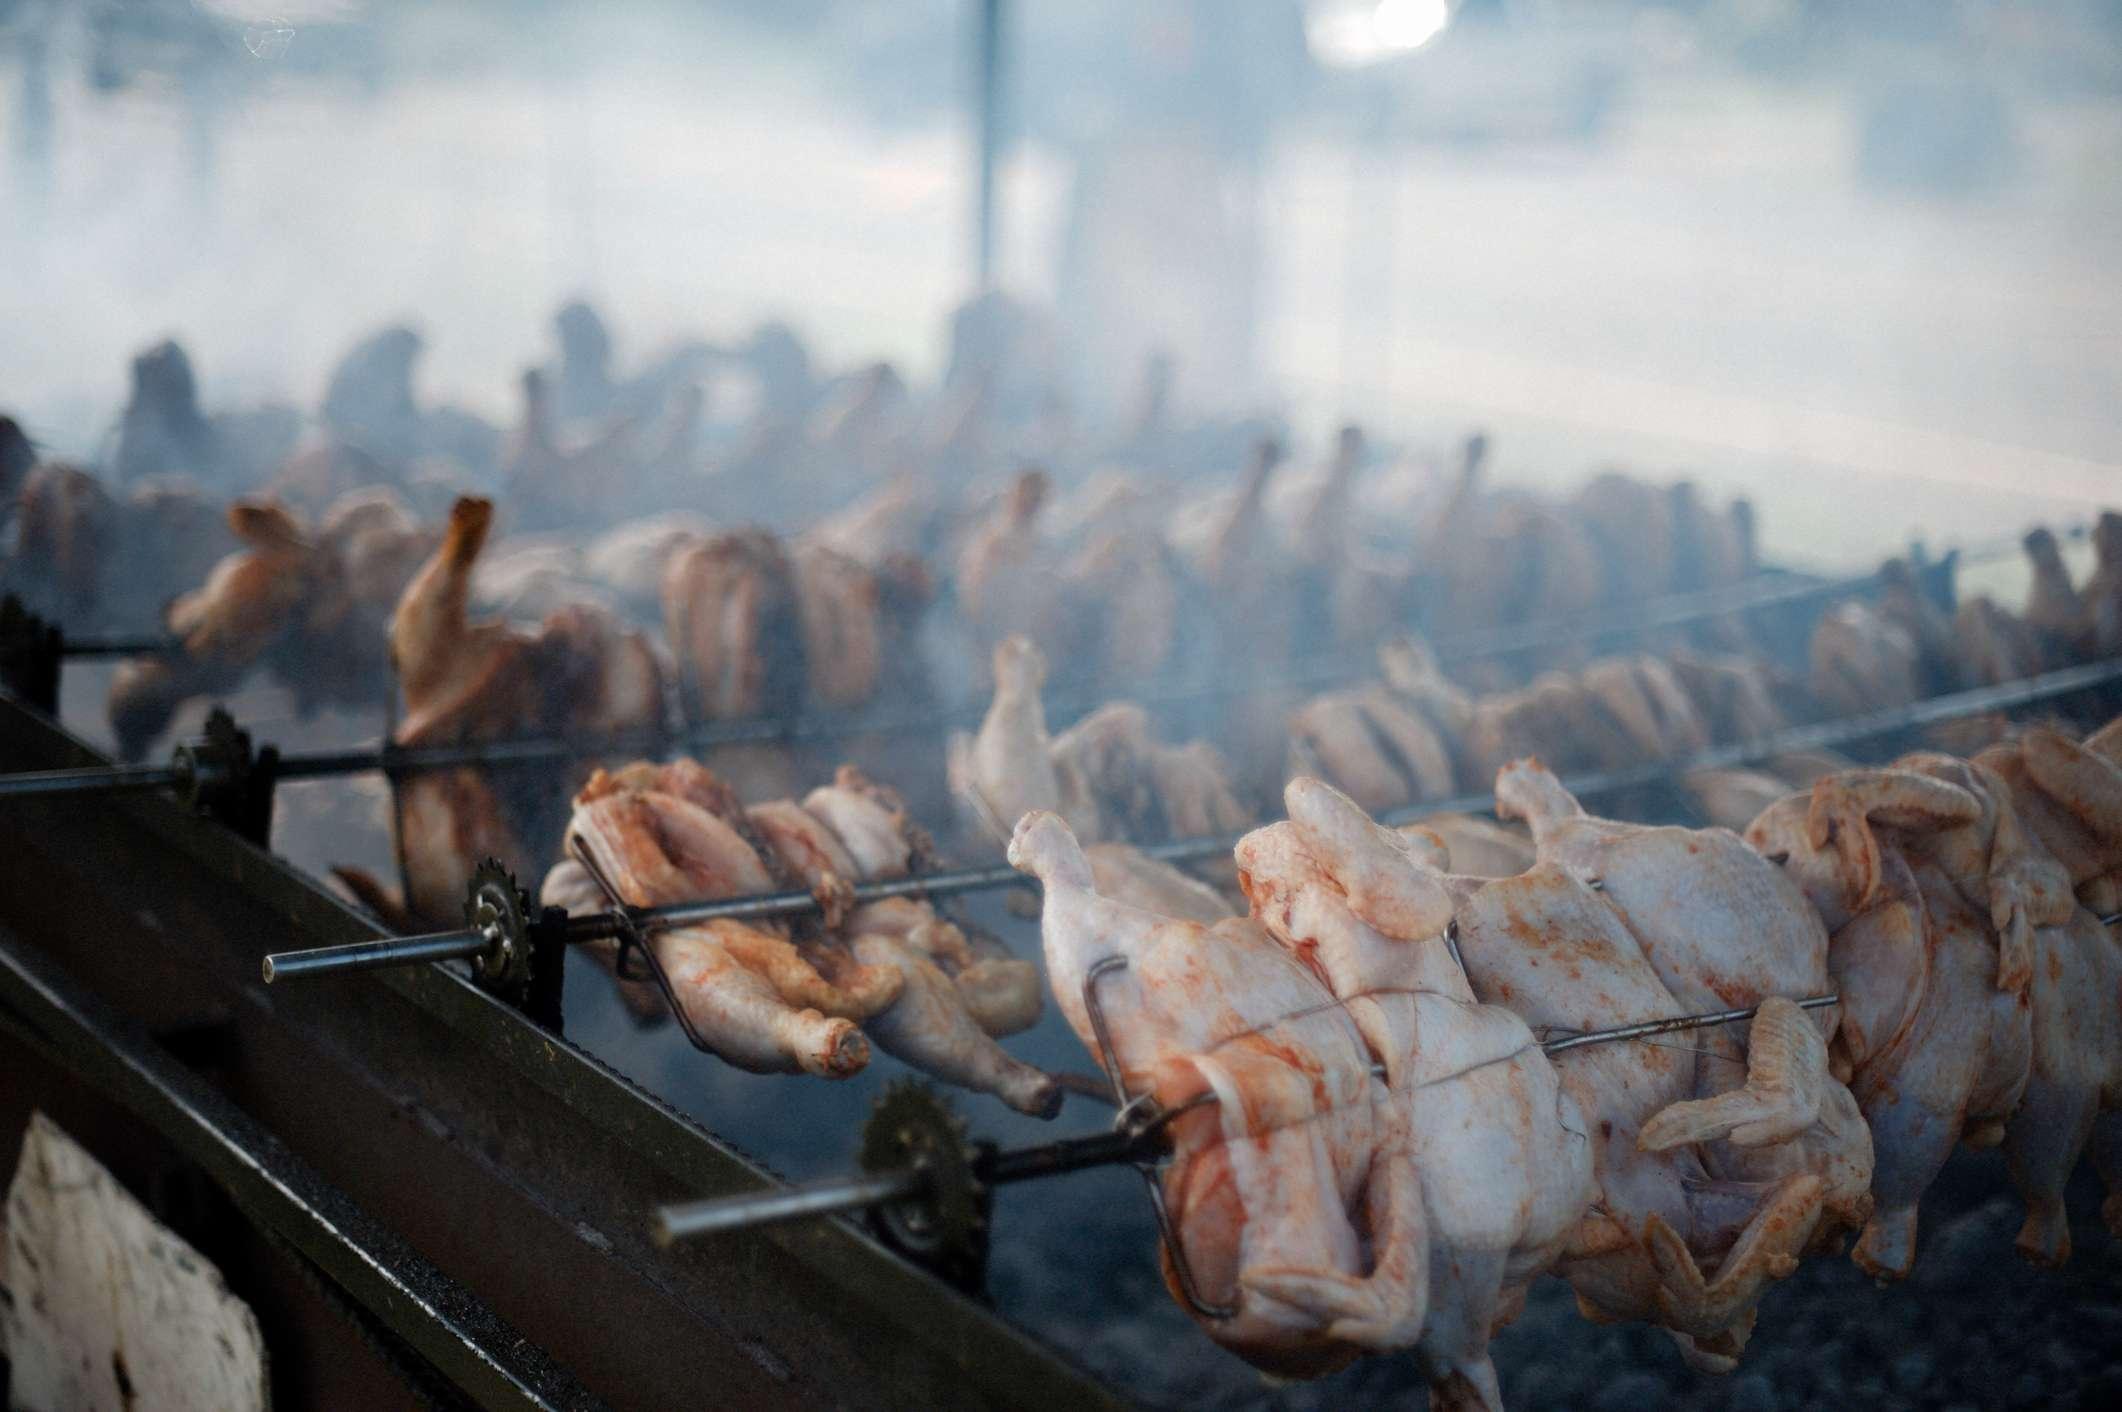 Huli Huli Chicken at the farmers market in Waimea